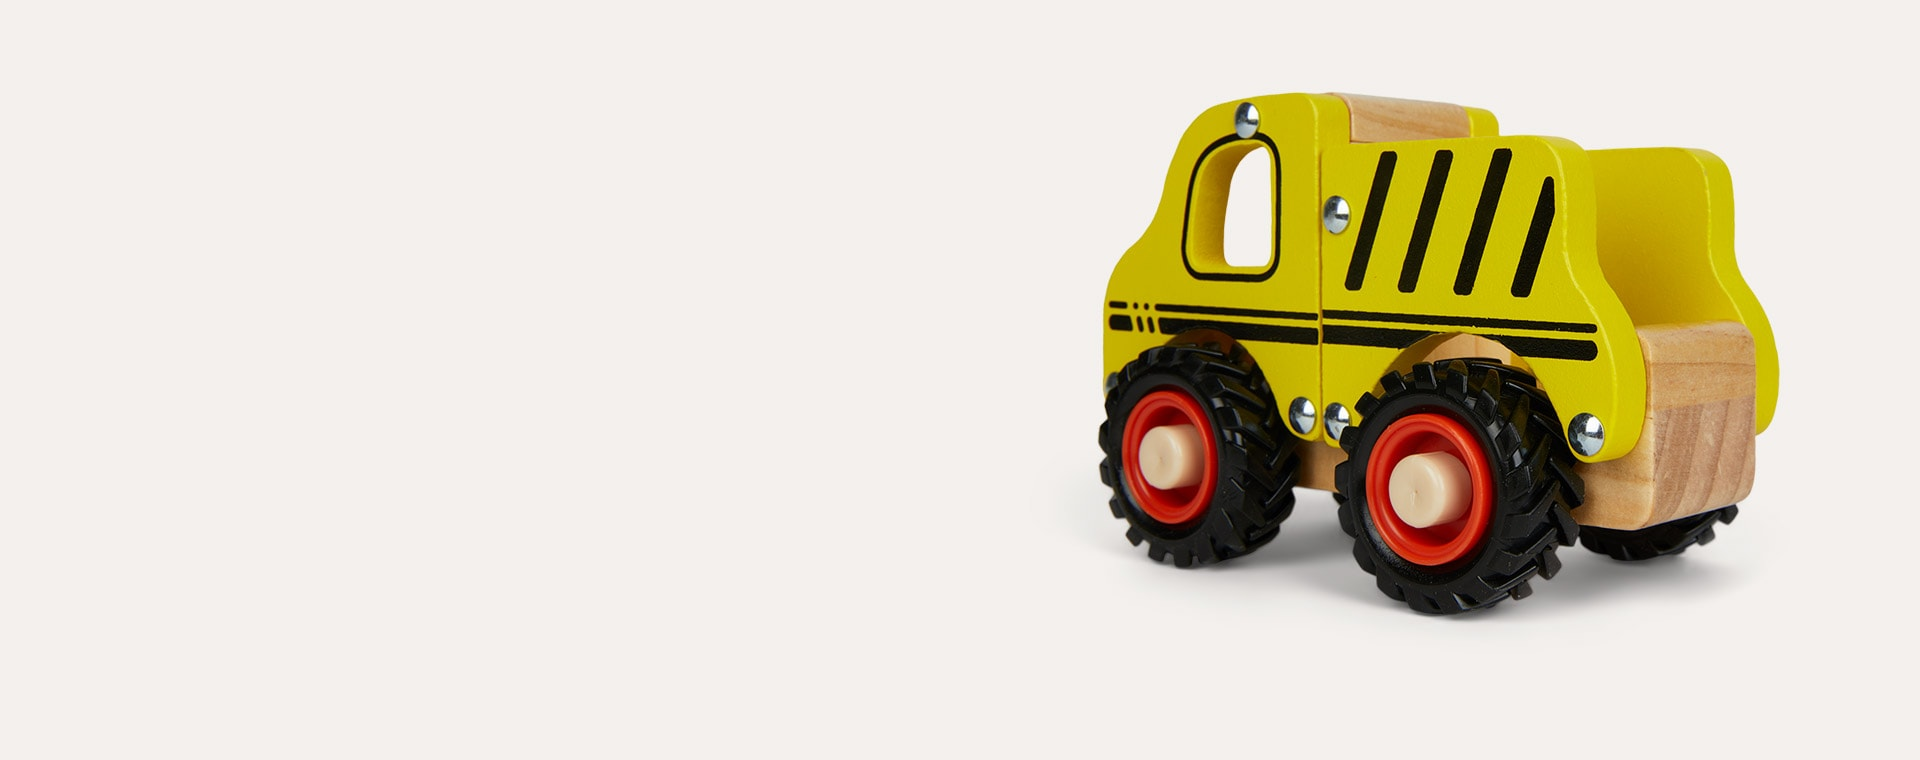 Yellow Legler Toys Construction Site Vehicle